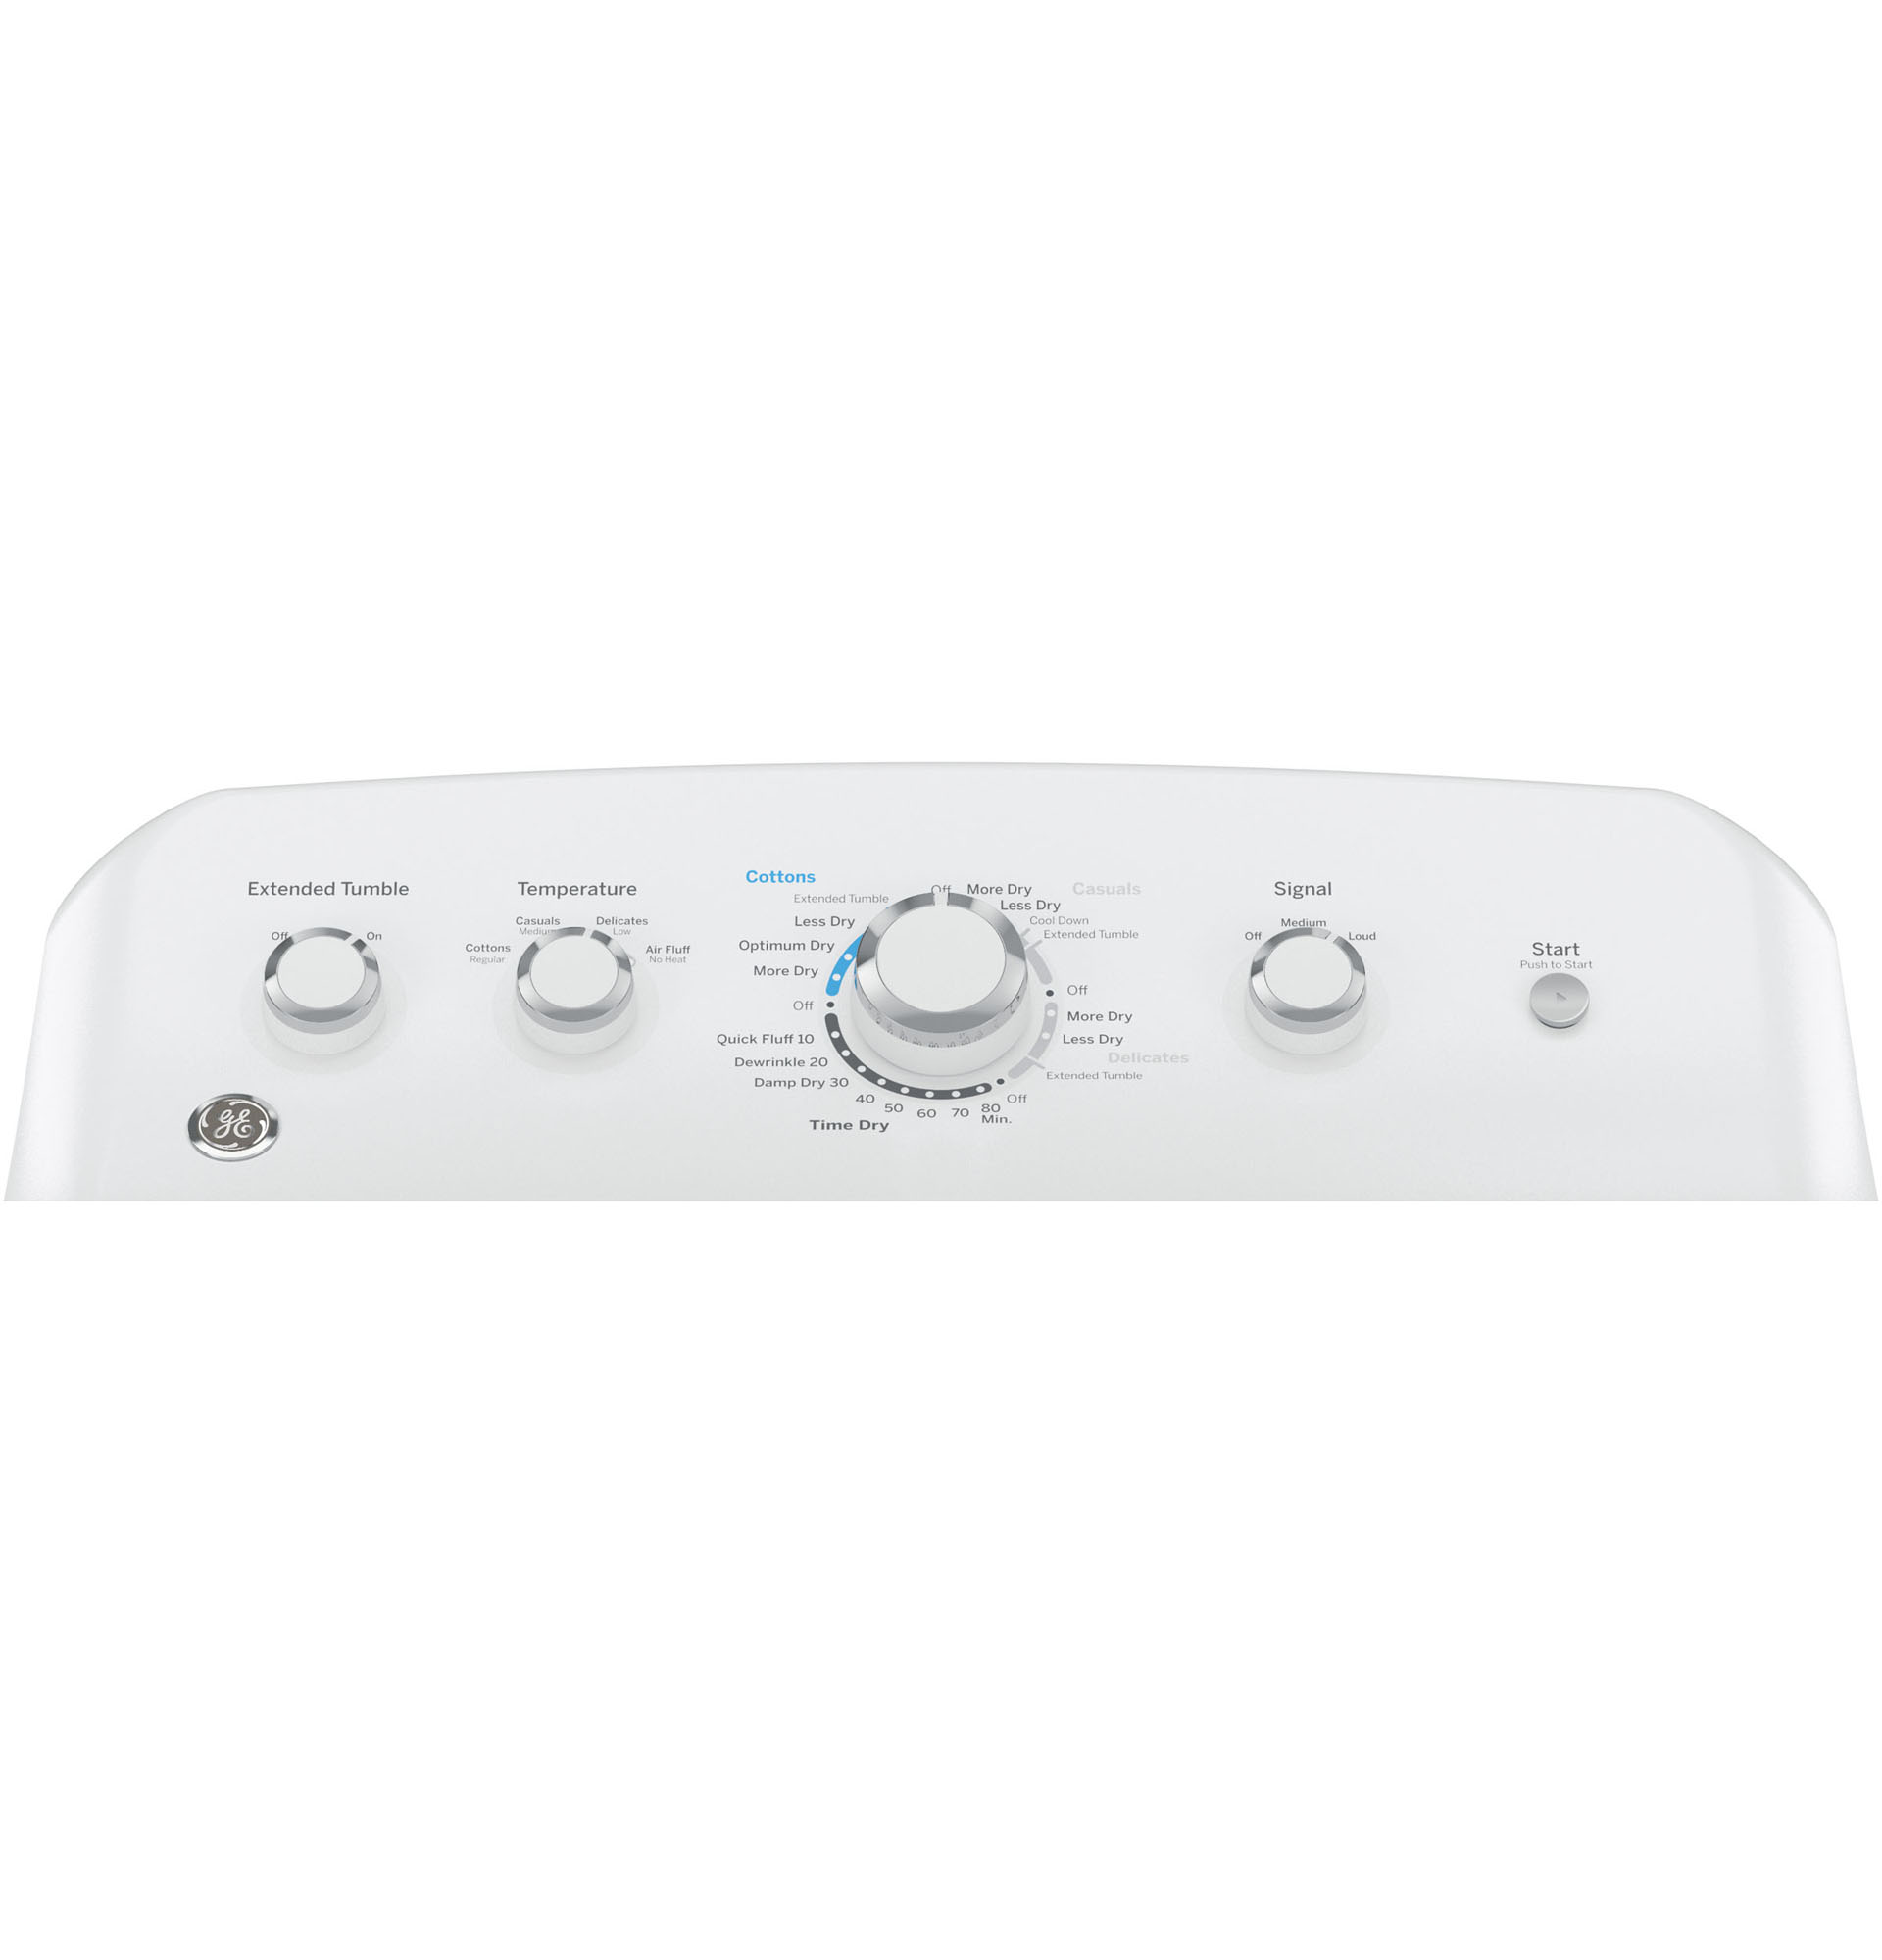 GE Appliances GTX42EASJWW 6.2 cu. ft. Electric Dryer w/ HE Sensor Dry - White